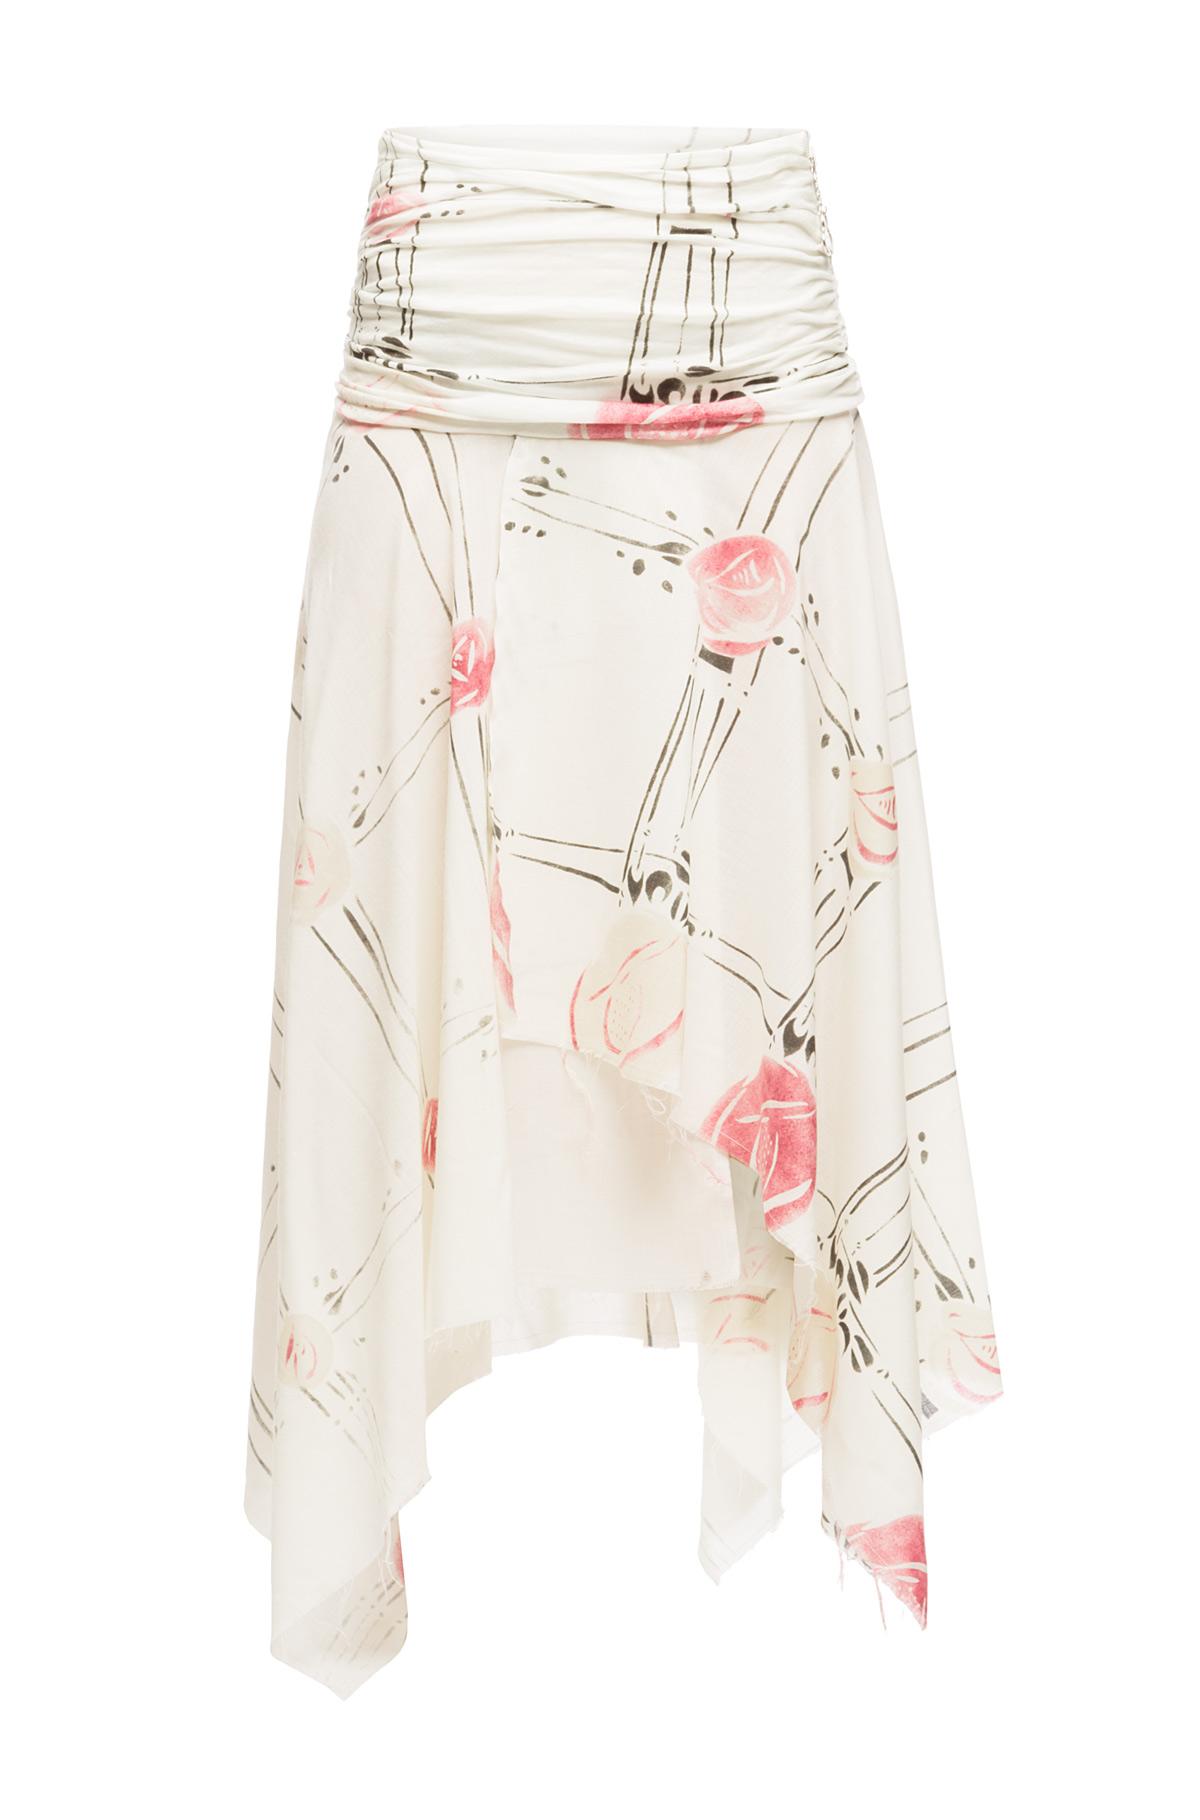 LOEWE Asymmetric Skirt Roses Ecru/Multicolor front